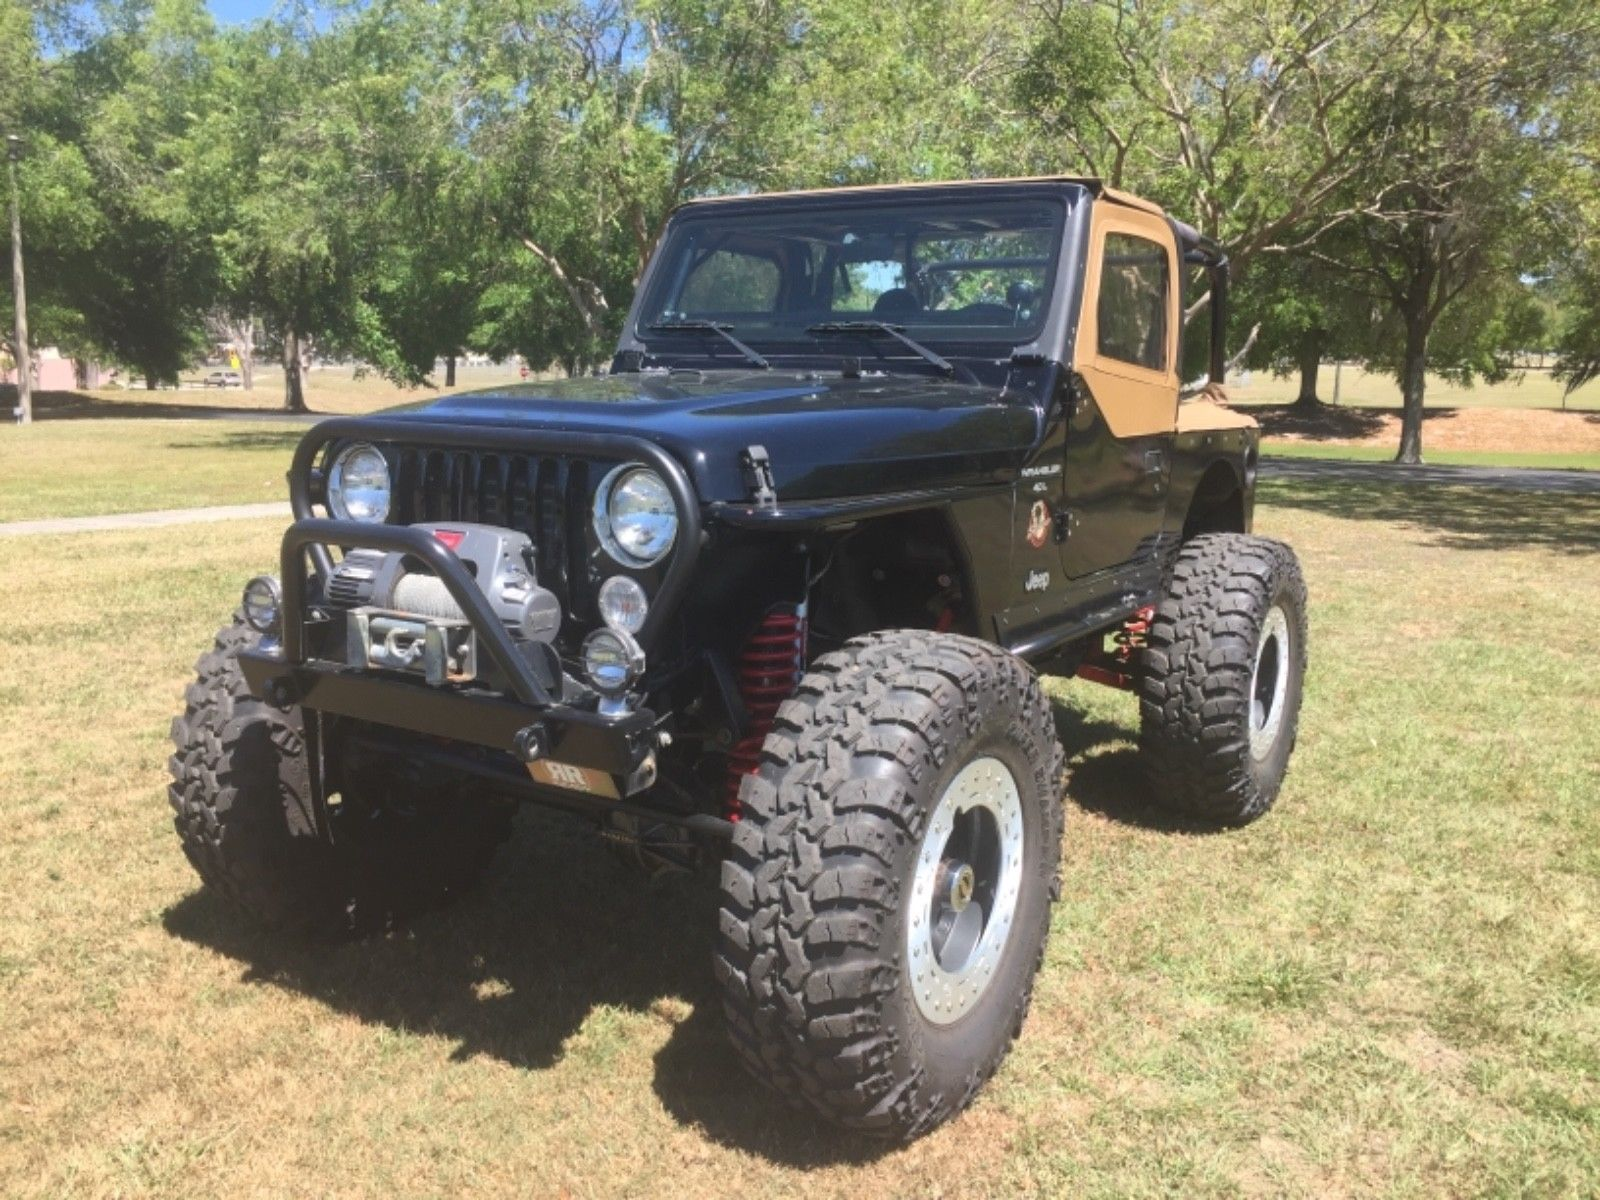 1999 Jeep Wrangler Sahara 1999 Jeep Wrangler Tj Sahara 5 7 Pro Rock 60 2017 2018 Is In Stock And For Sale Mycarboard Com